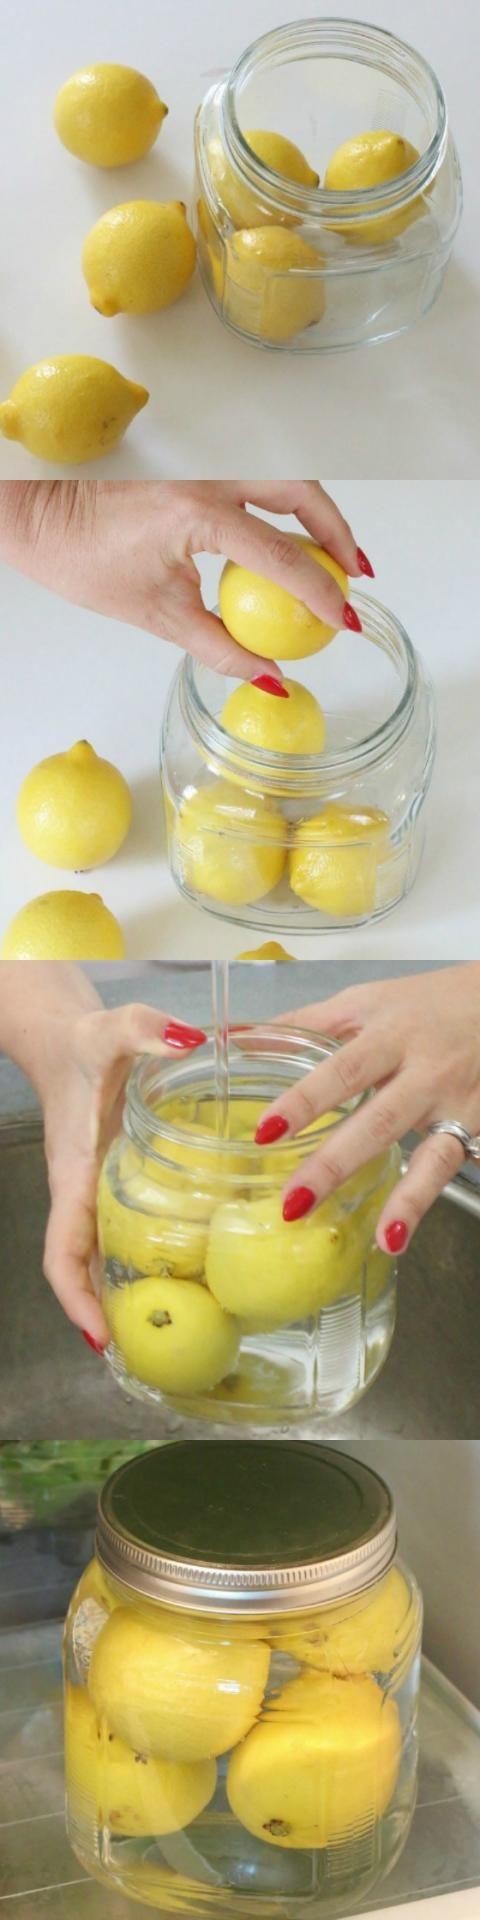 how to store lemons 6